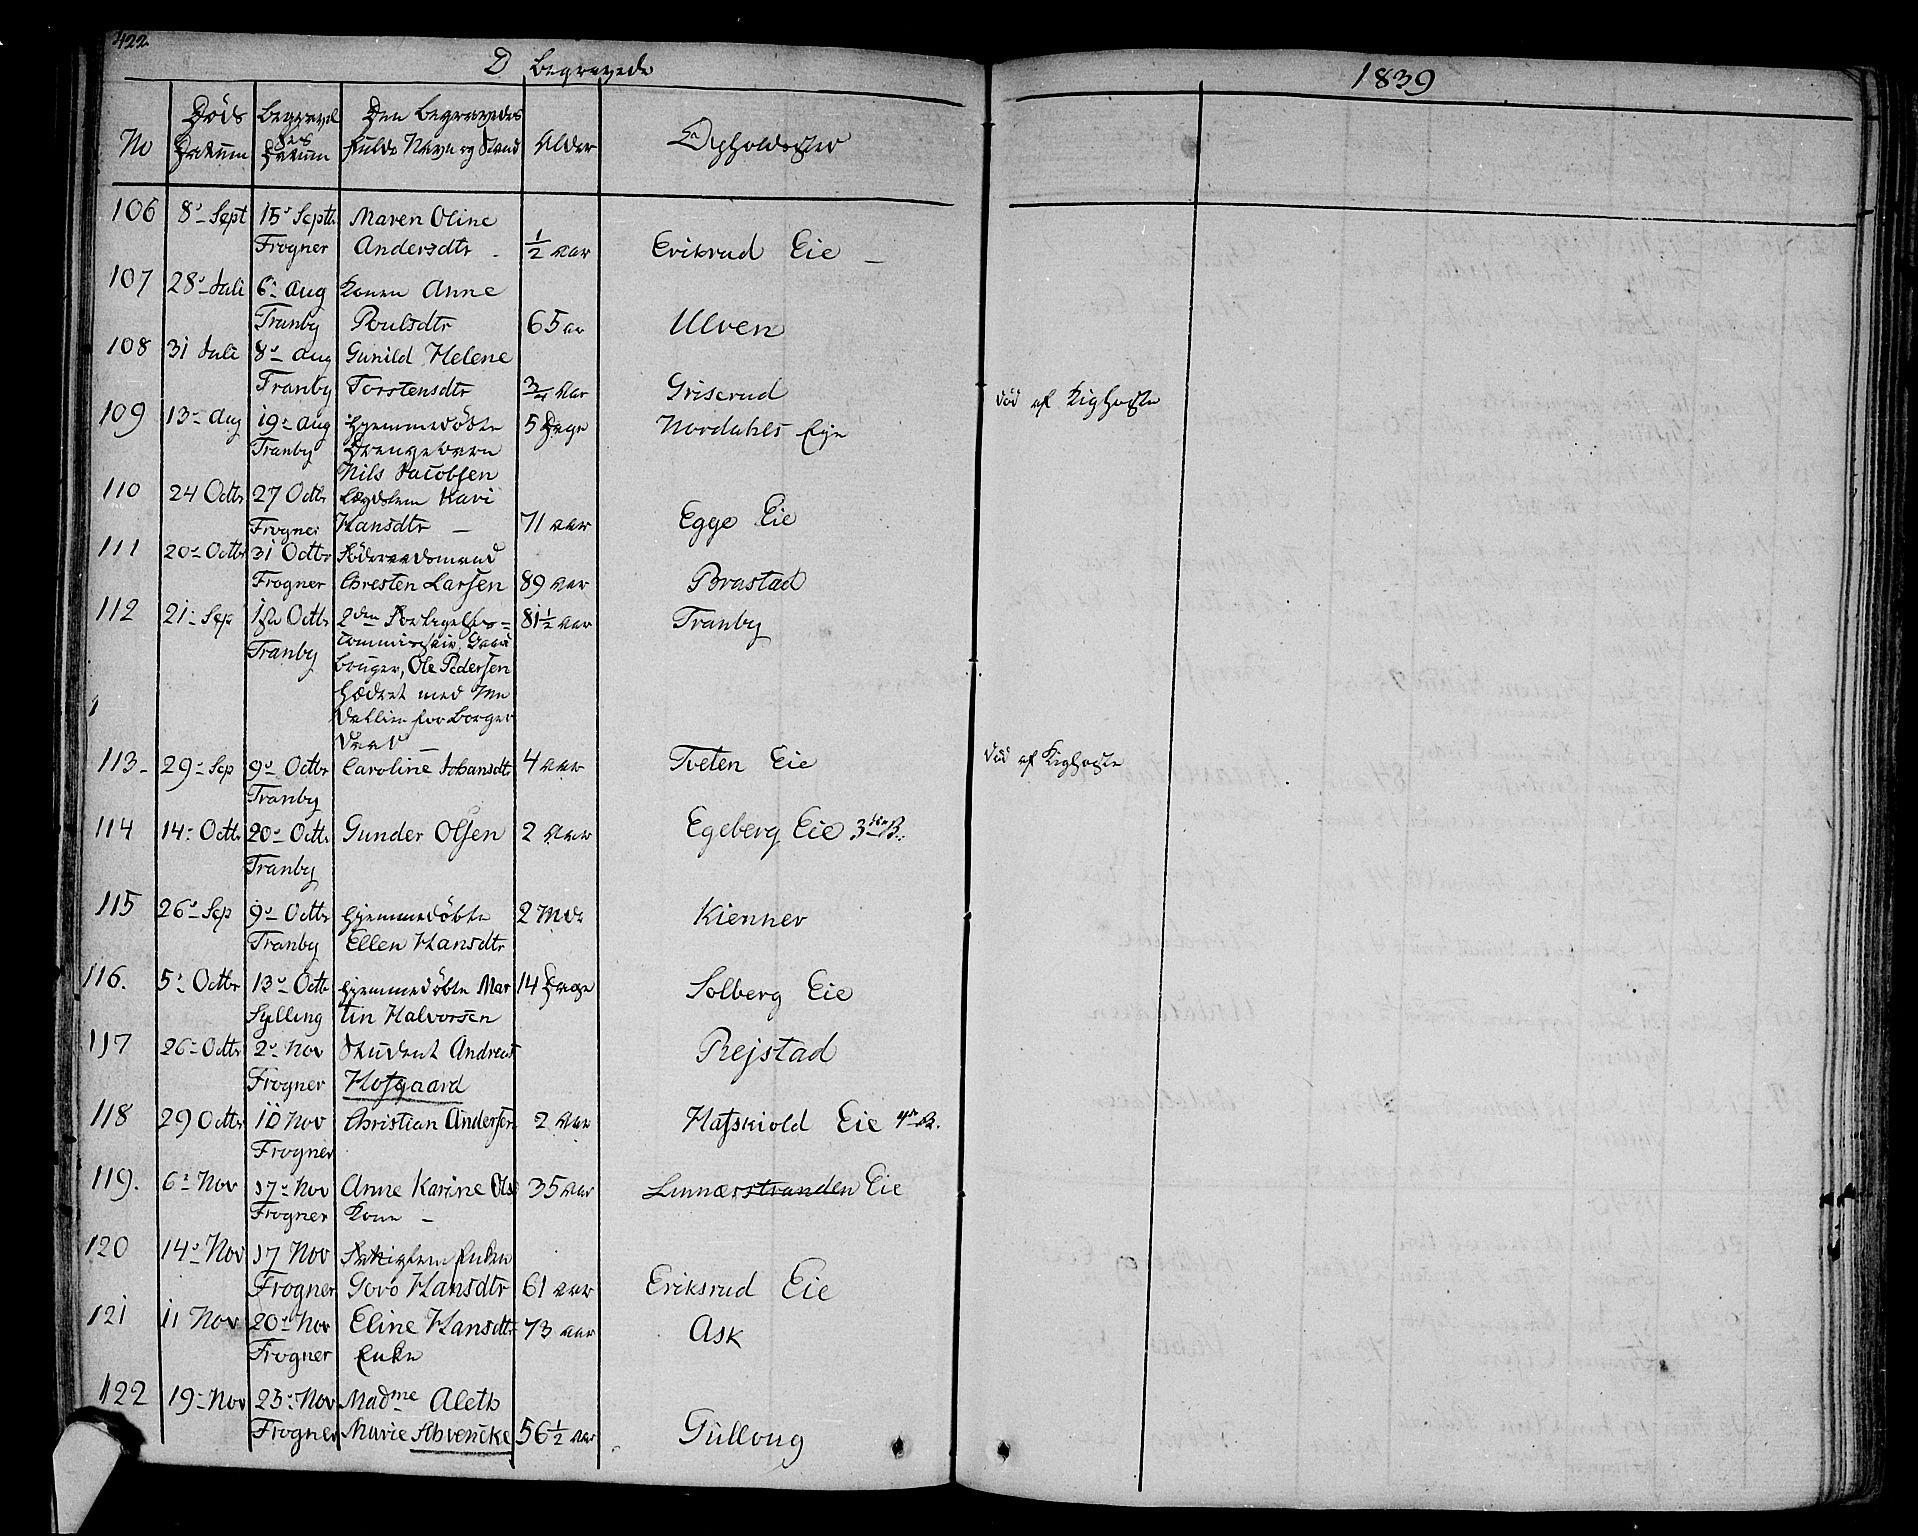 SAKO, Lier kirkebøker, F/Fa/L0010: Ministerialbok nr. I 10, 1827-1843, s. 422